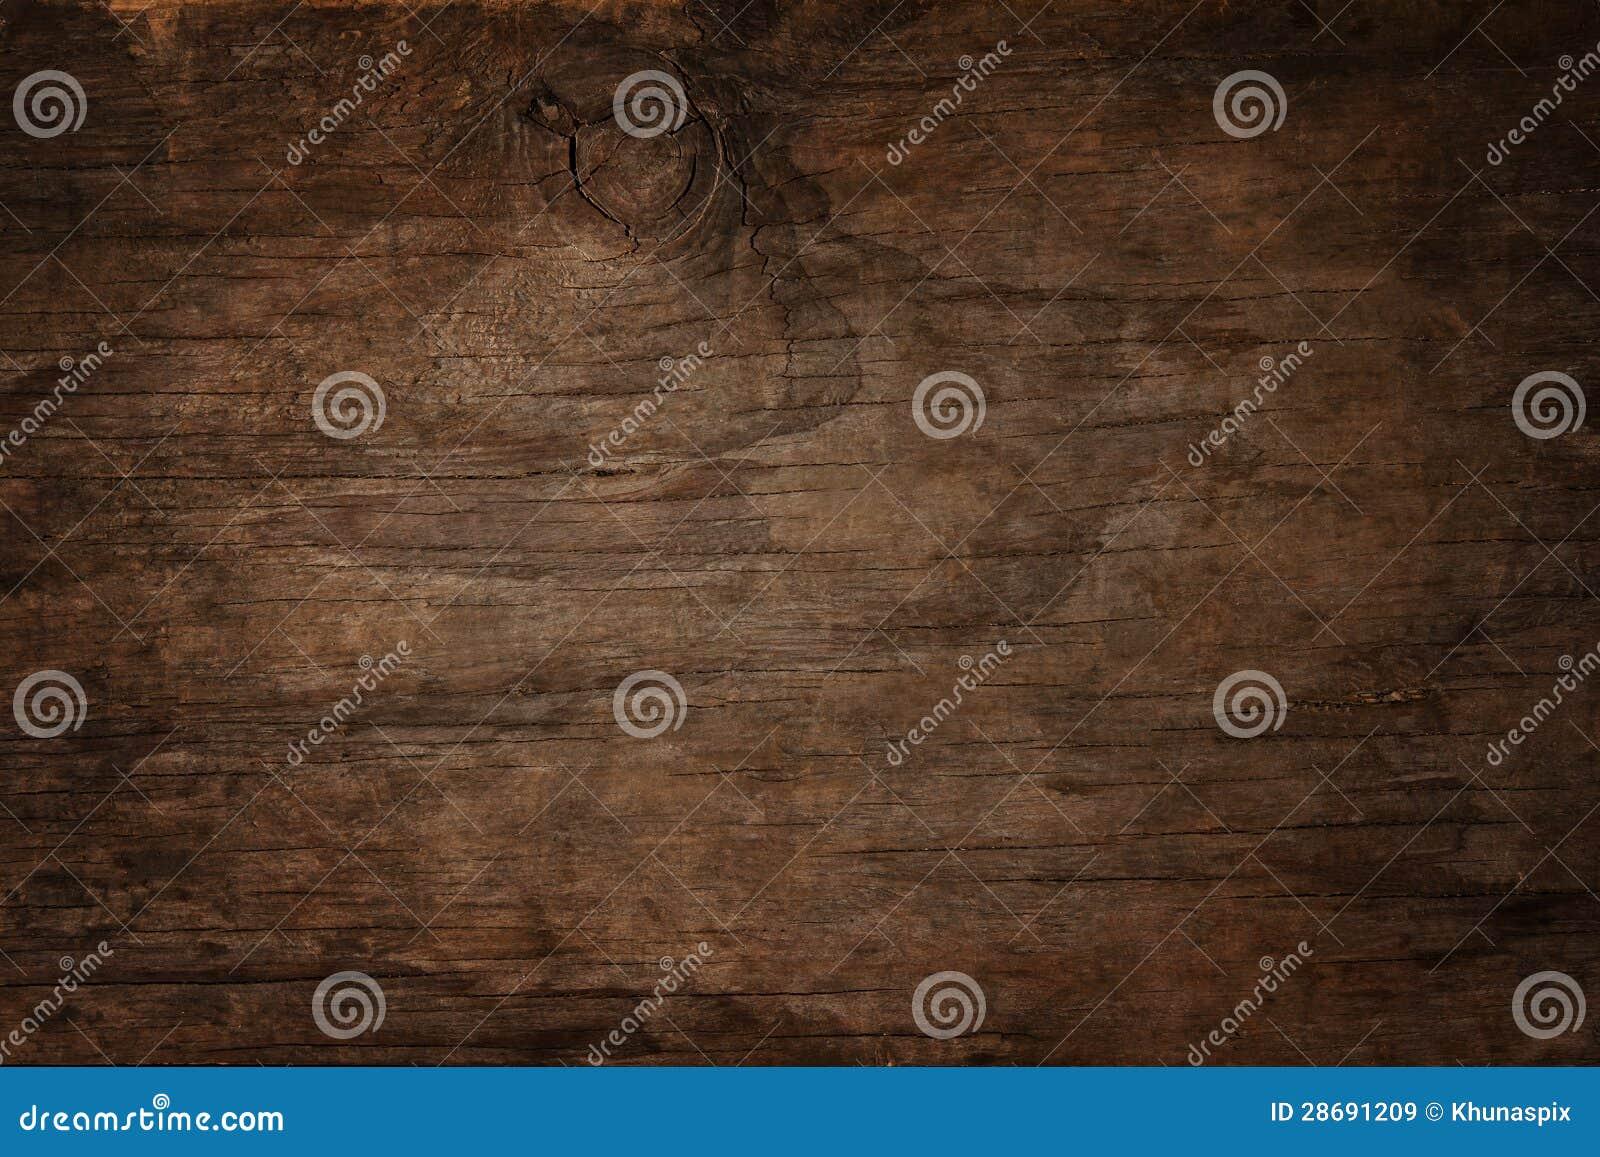 Textura do uso de madeira da casca como o fundo natural